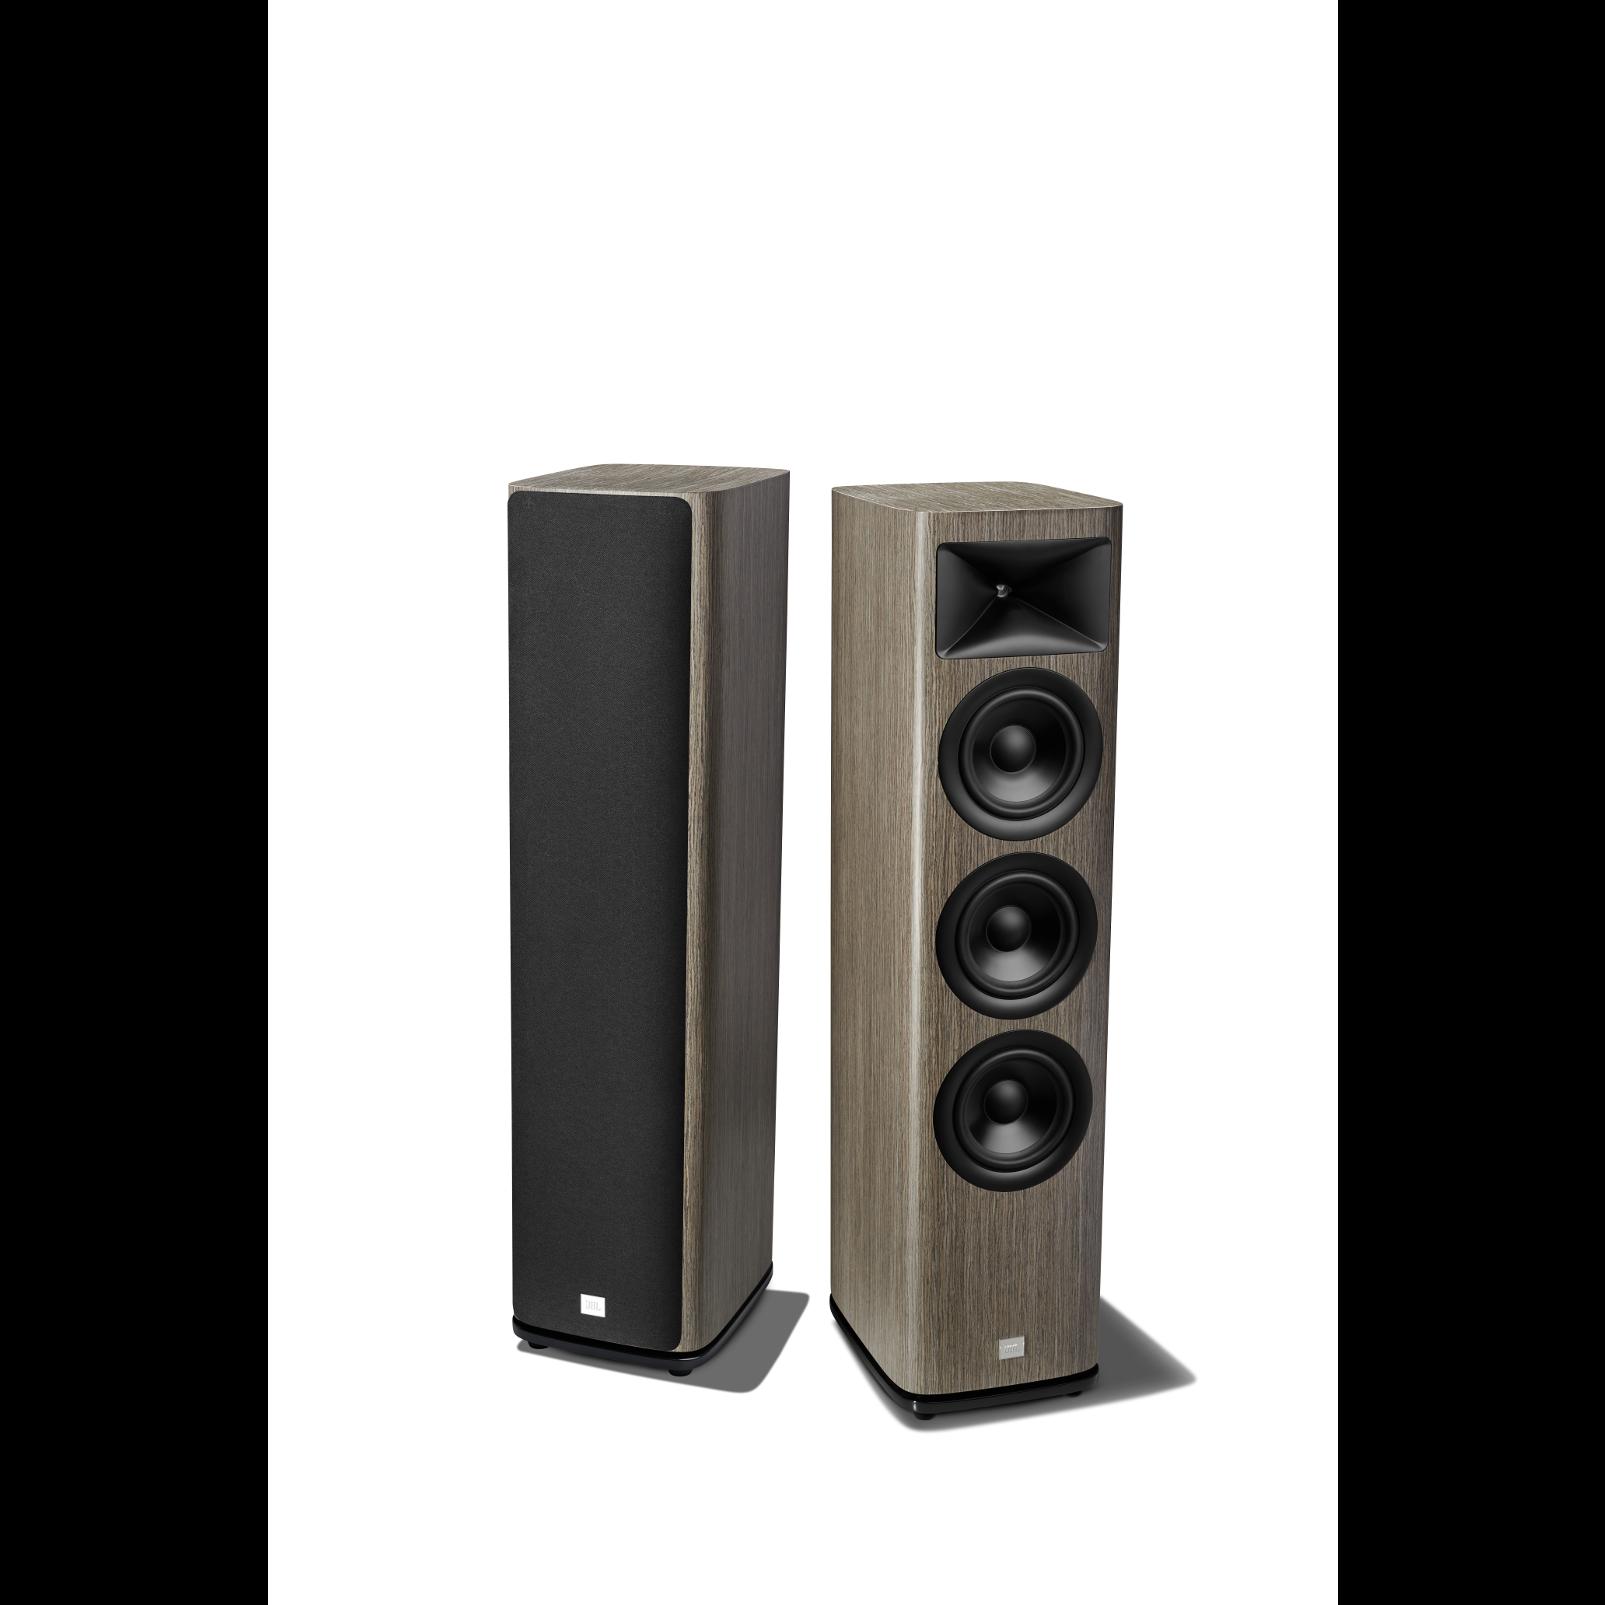 HDI-3600 - Grey Oak - 2 ½-way Triple 6.5-inch (165mm) Floorstanding Loudspeaker - Detailshot 1